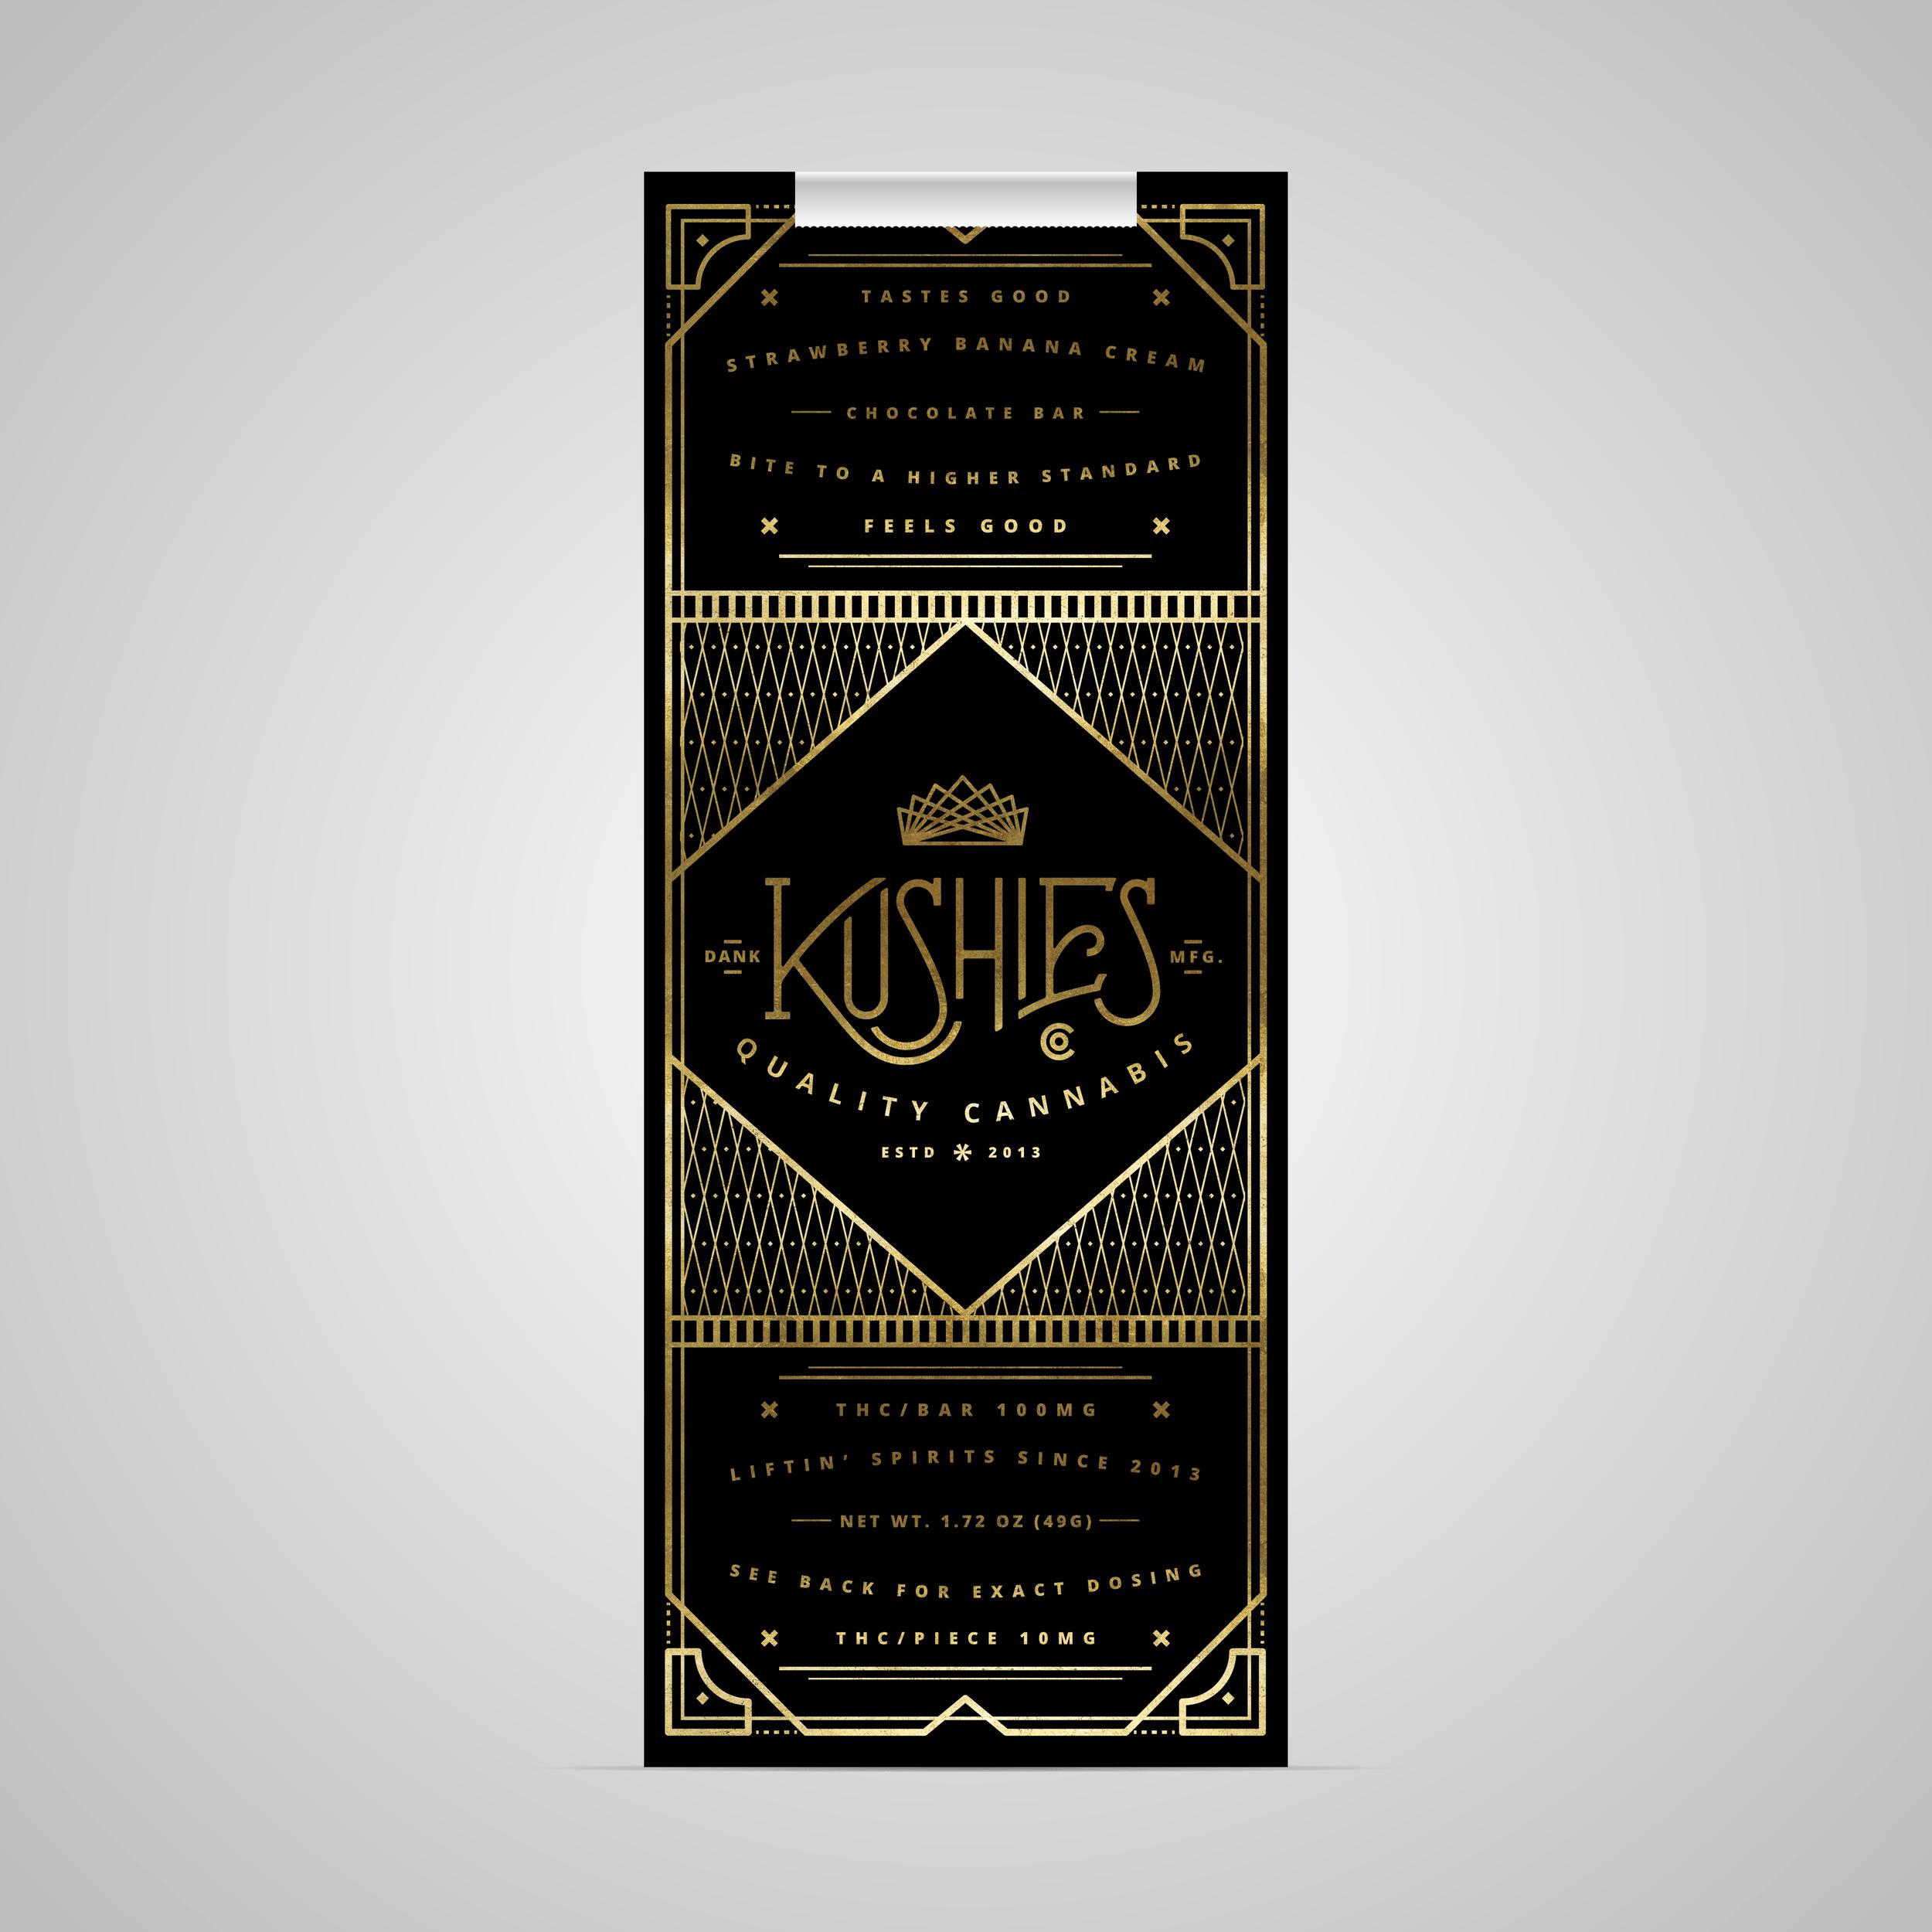 Oddly Brand Co. – Kushies Chocolate Box (Concept)